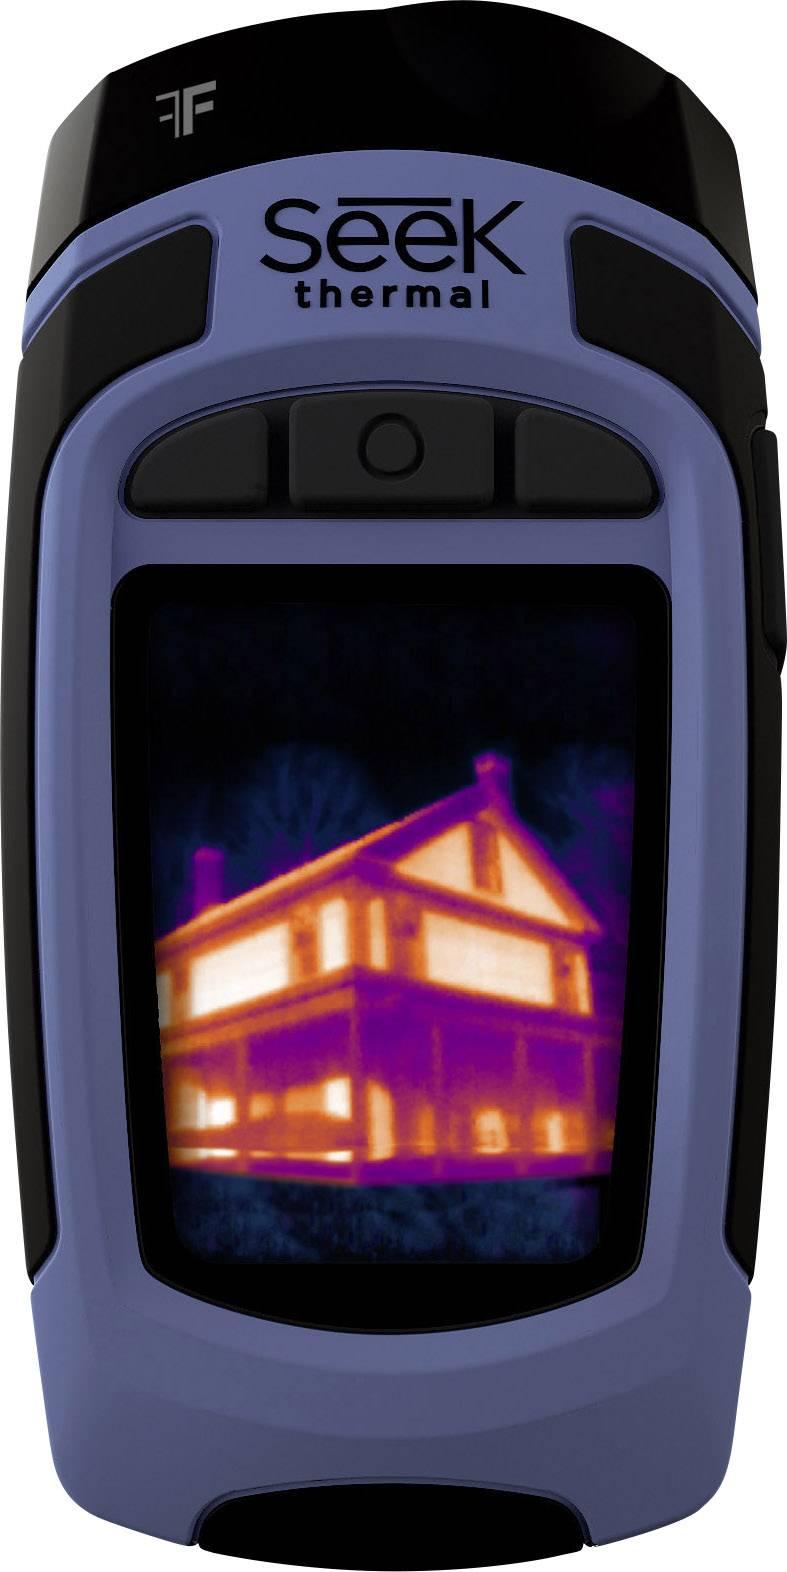 Termokamera s LED svítilnou Seek Thermal Reveal FF (Fast Frame) RW-EAAX, 206 x 156 pix